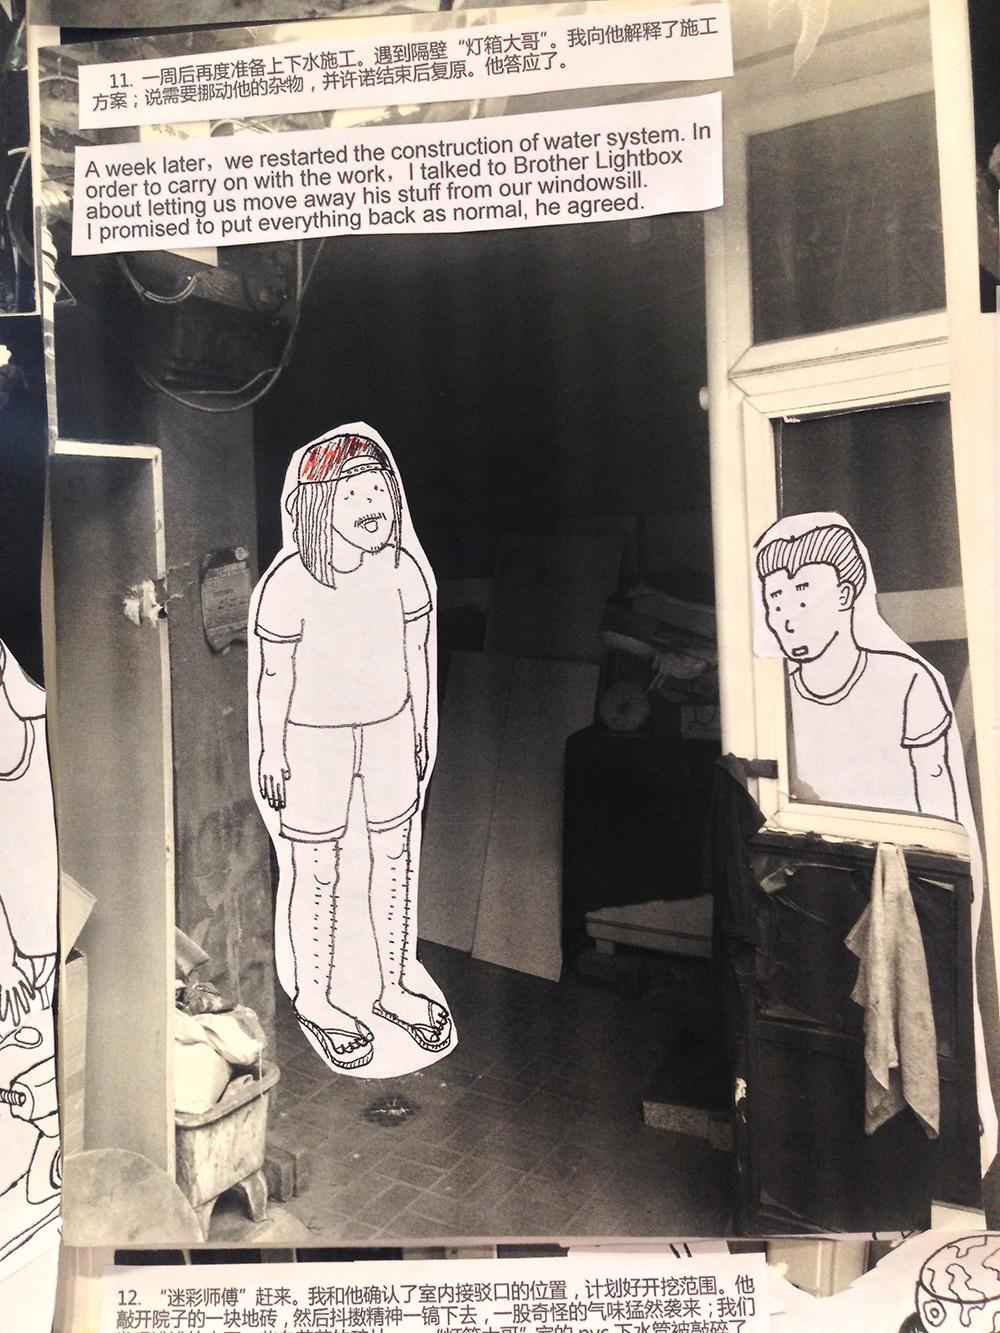 Caopu-humble-hostel-story2015-hisheji (11)